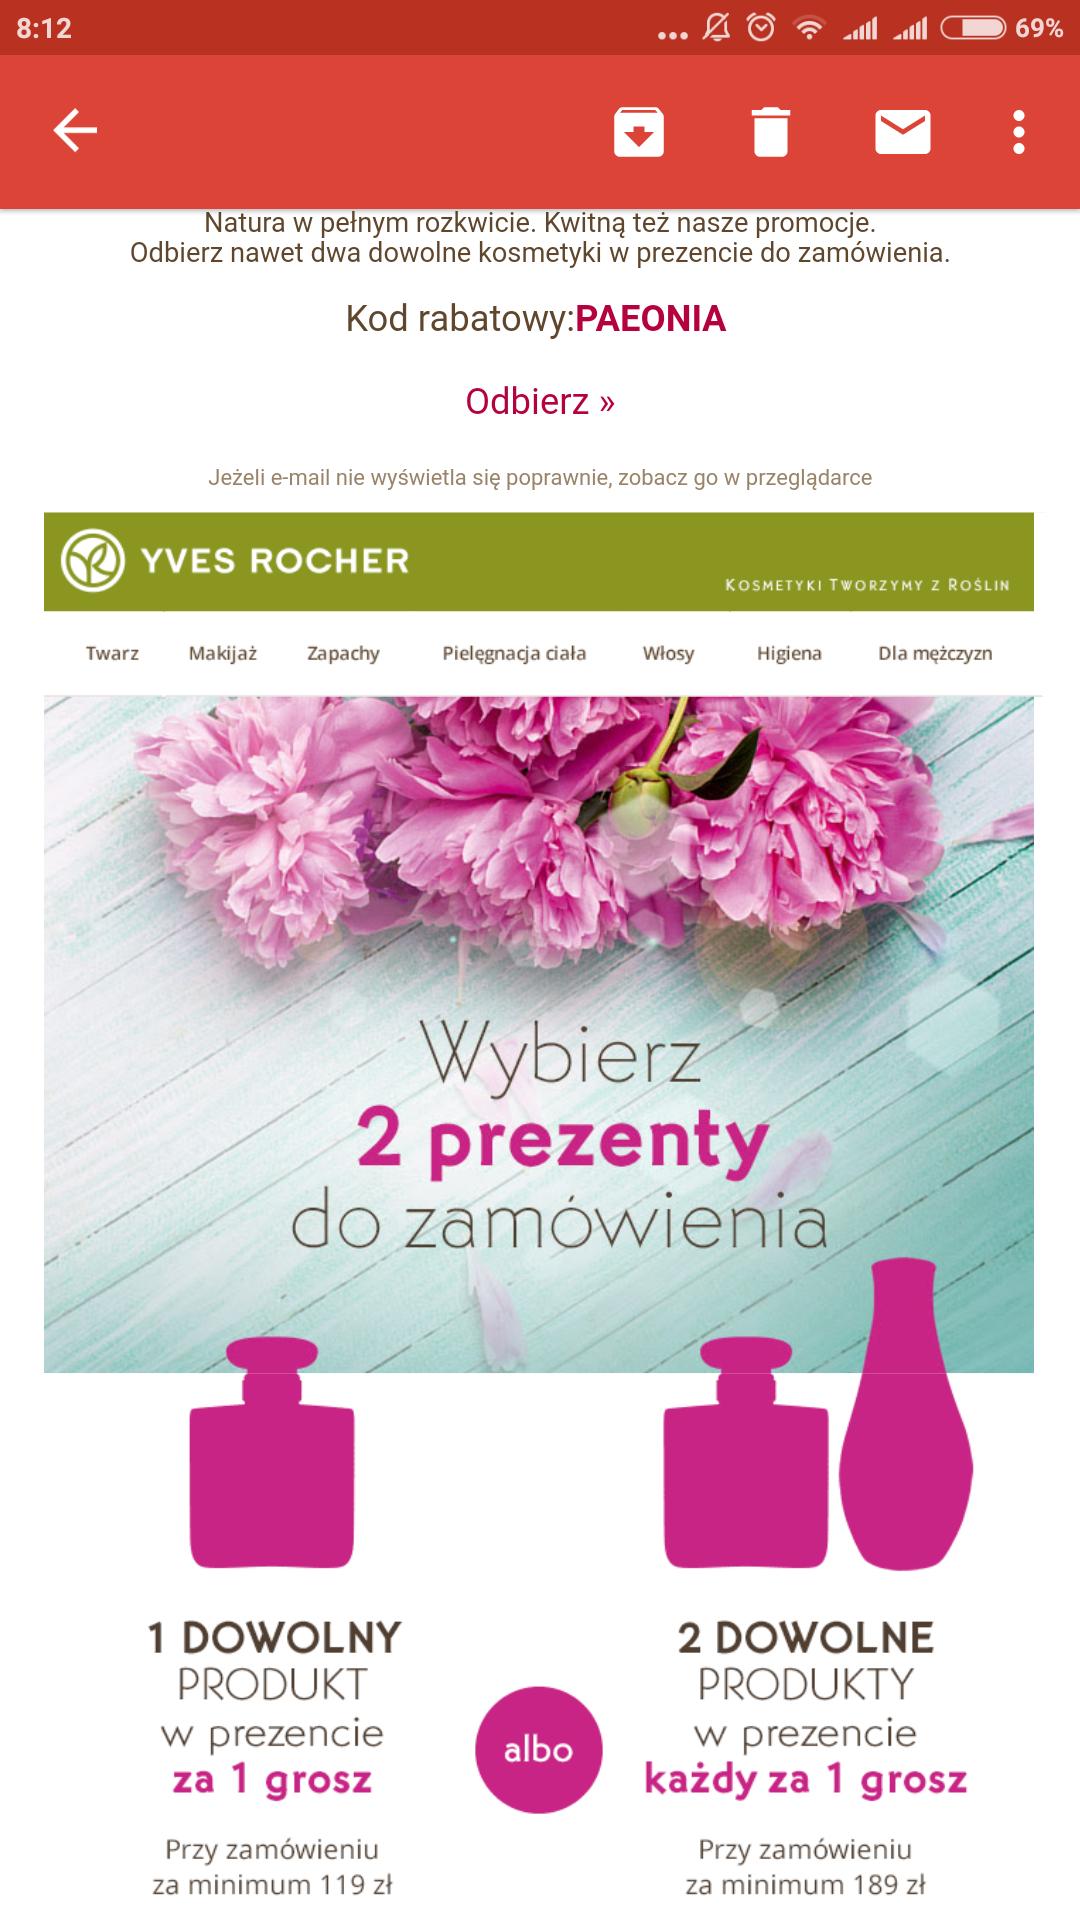 Yves rocher 2 produkty za 1 grosz badz 1 produkt za 1 grosz + pomadki